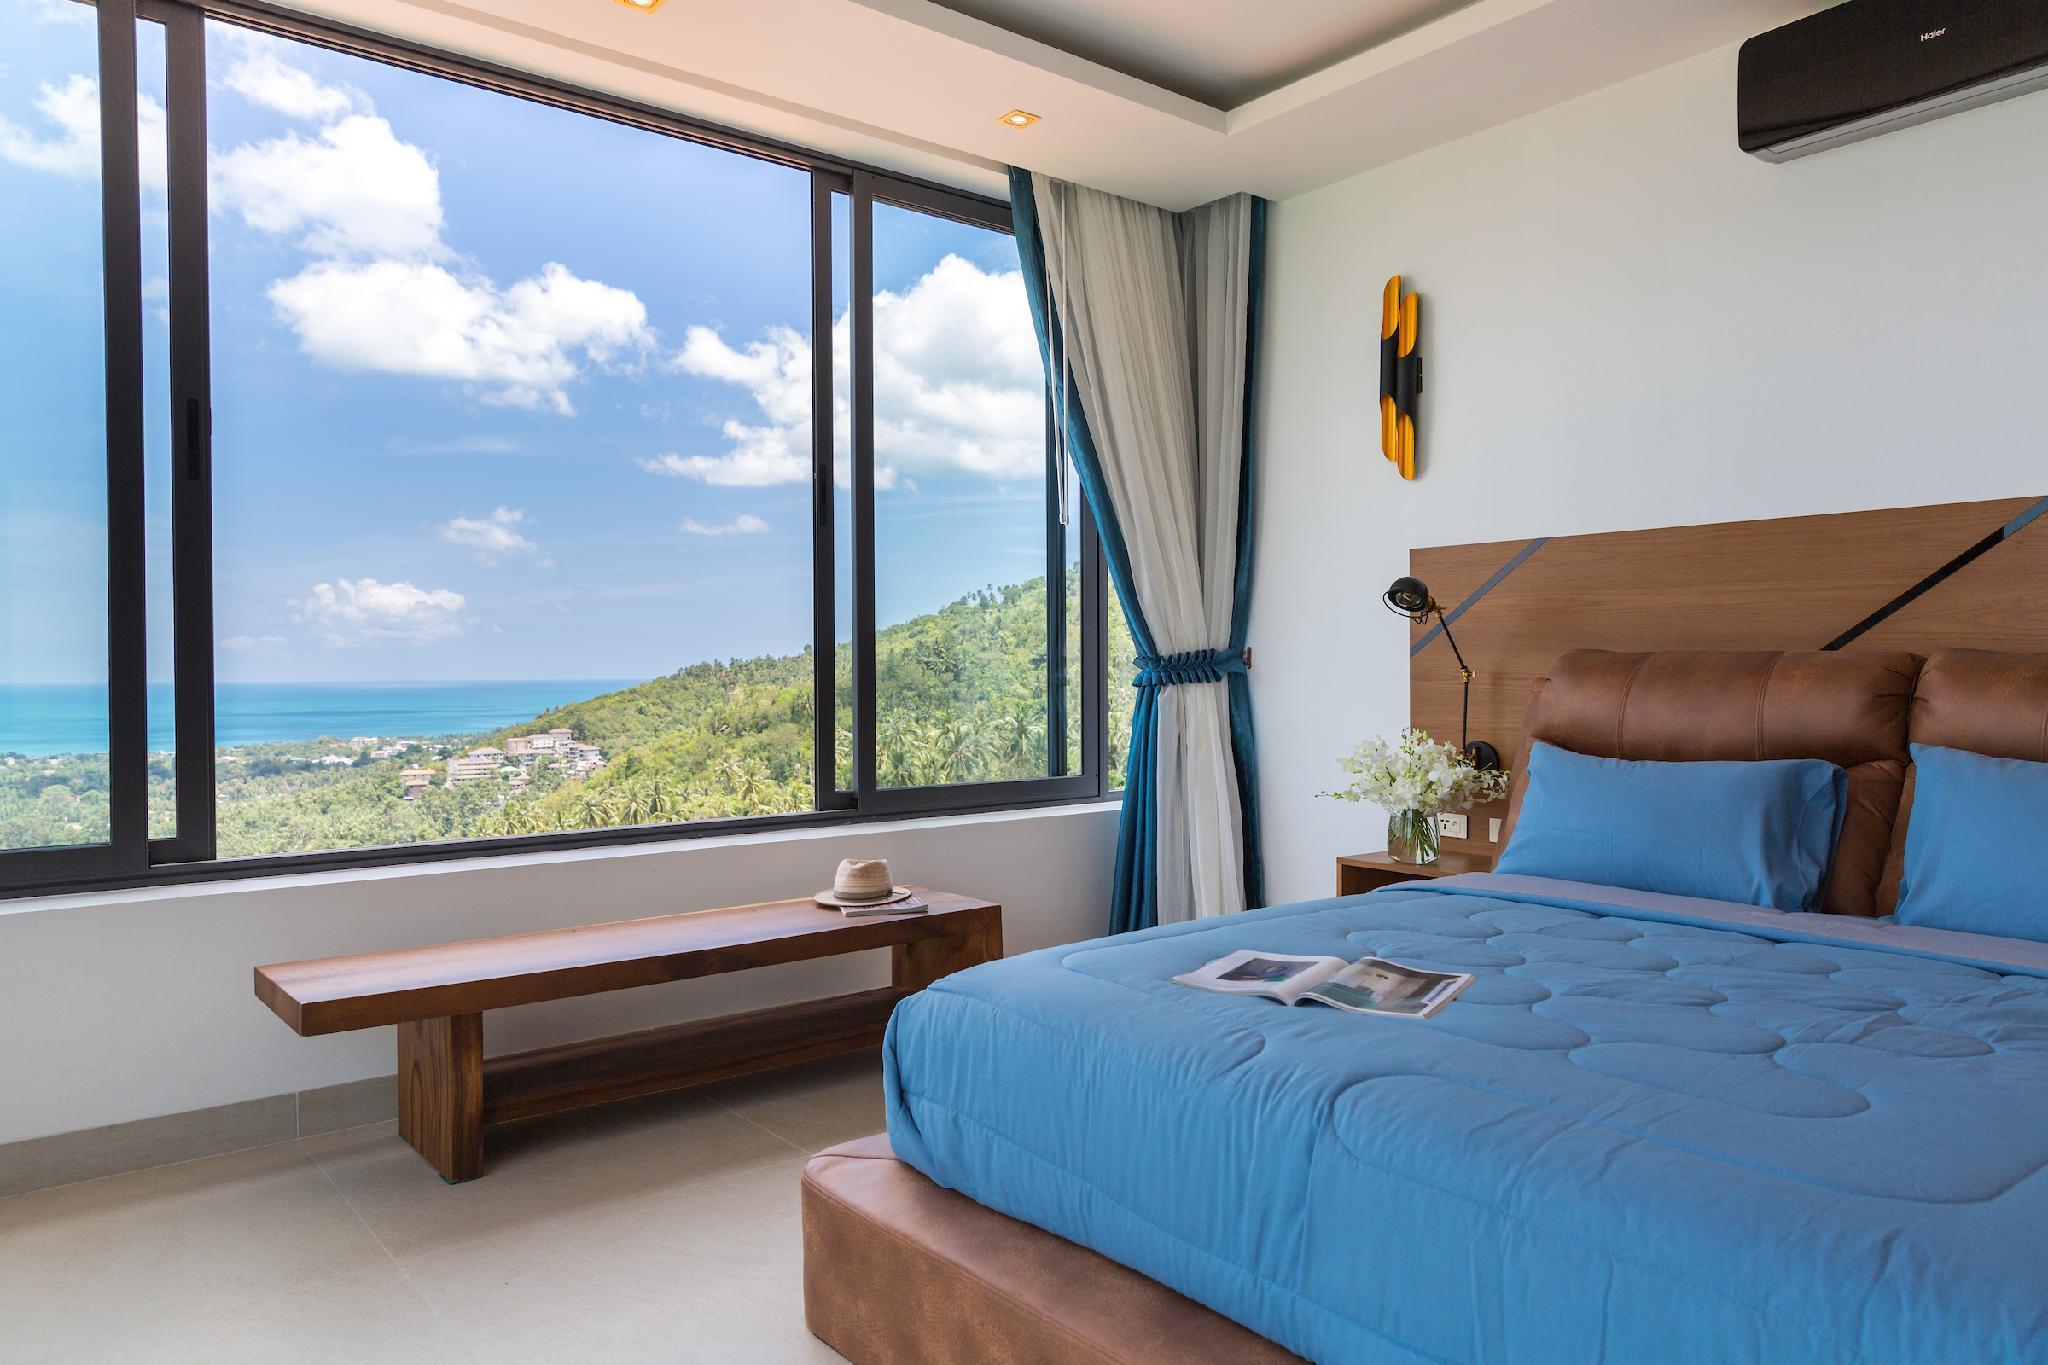 Awesome tranquil villa Victoria วิลลา 3 ห้องนอน 4 ห้องน้ำส่วนตัว ขนาด 330 ตร.ม. – หาดเฉวง